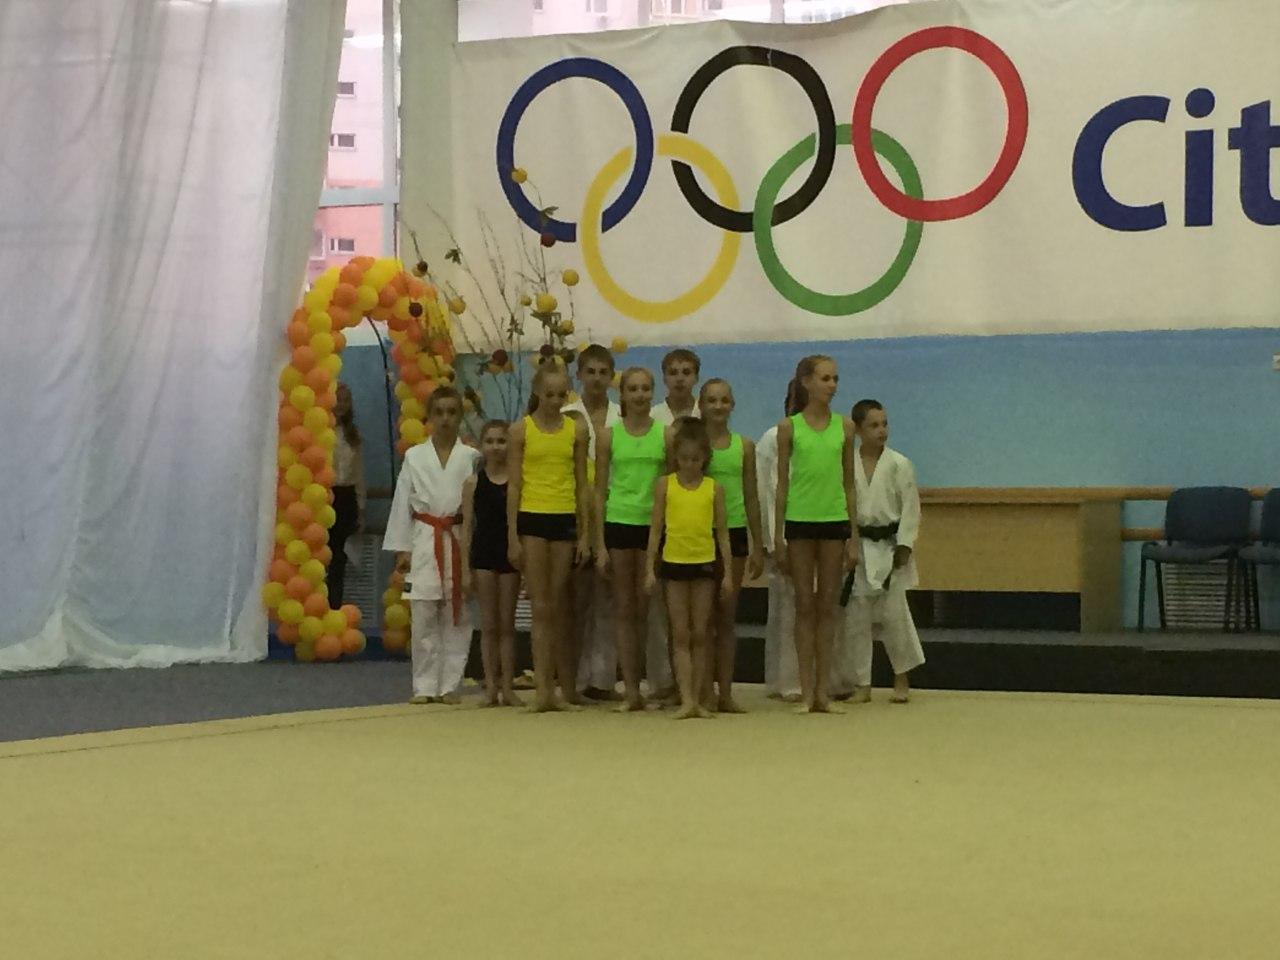 Поздравление от спортсменов сценка фото 790